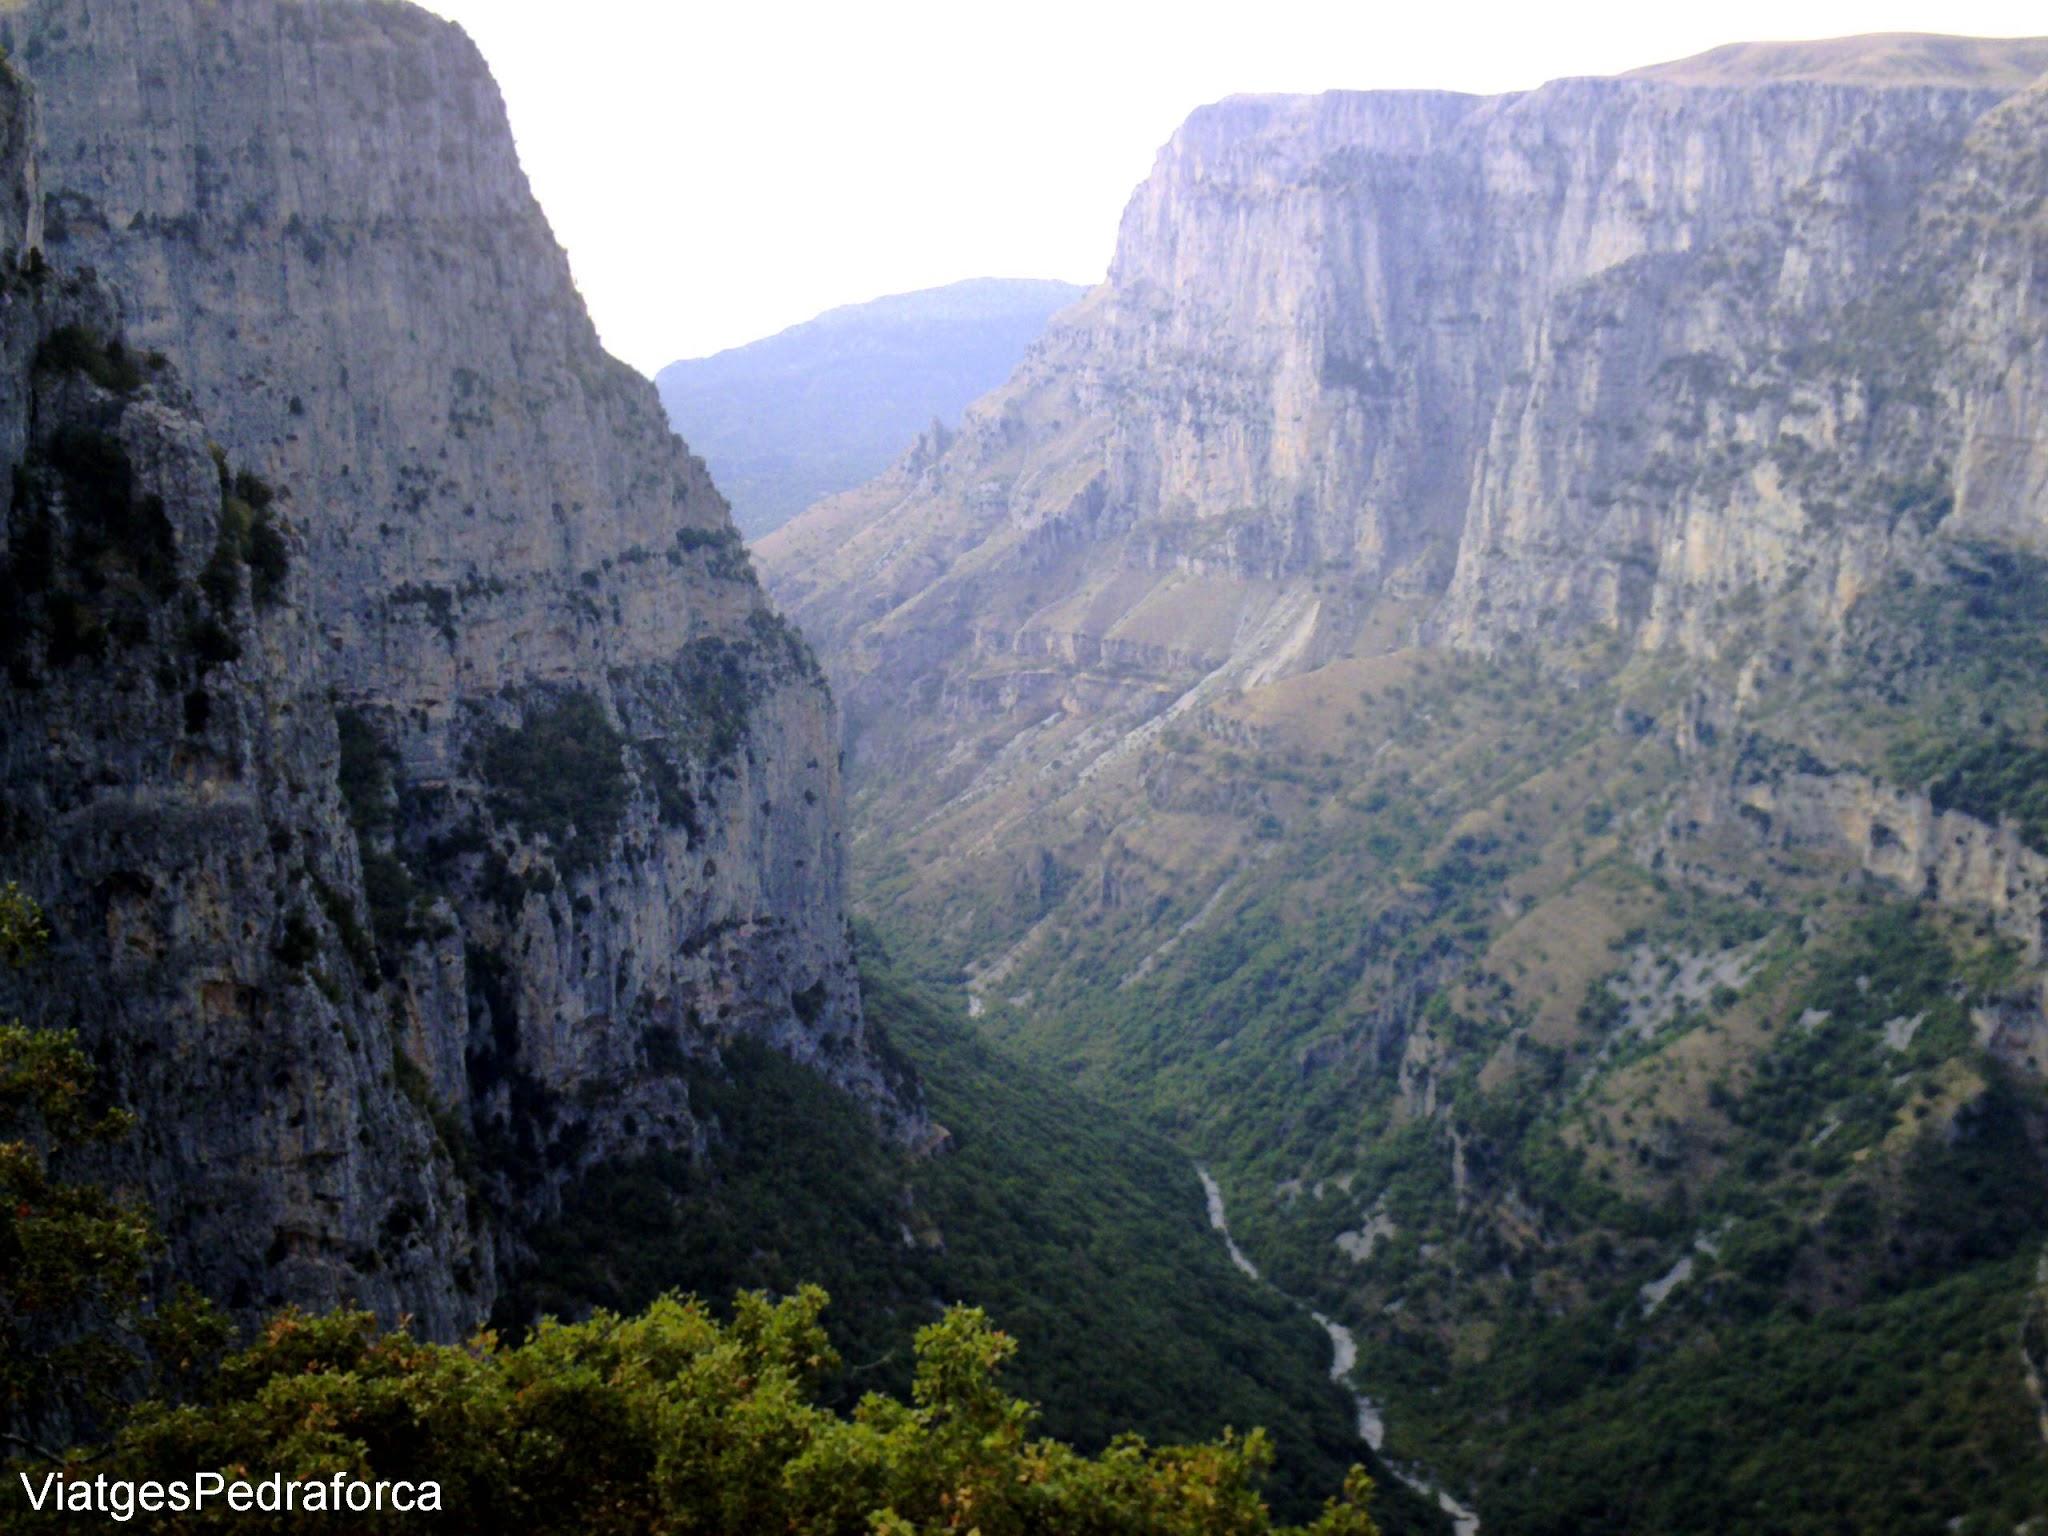 Vikos Gorge, Parc Nacional de Vikos-Aoos, Pindos, Grècia, Hellas, Greece